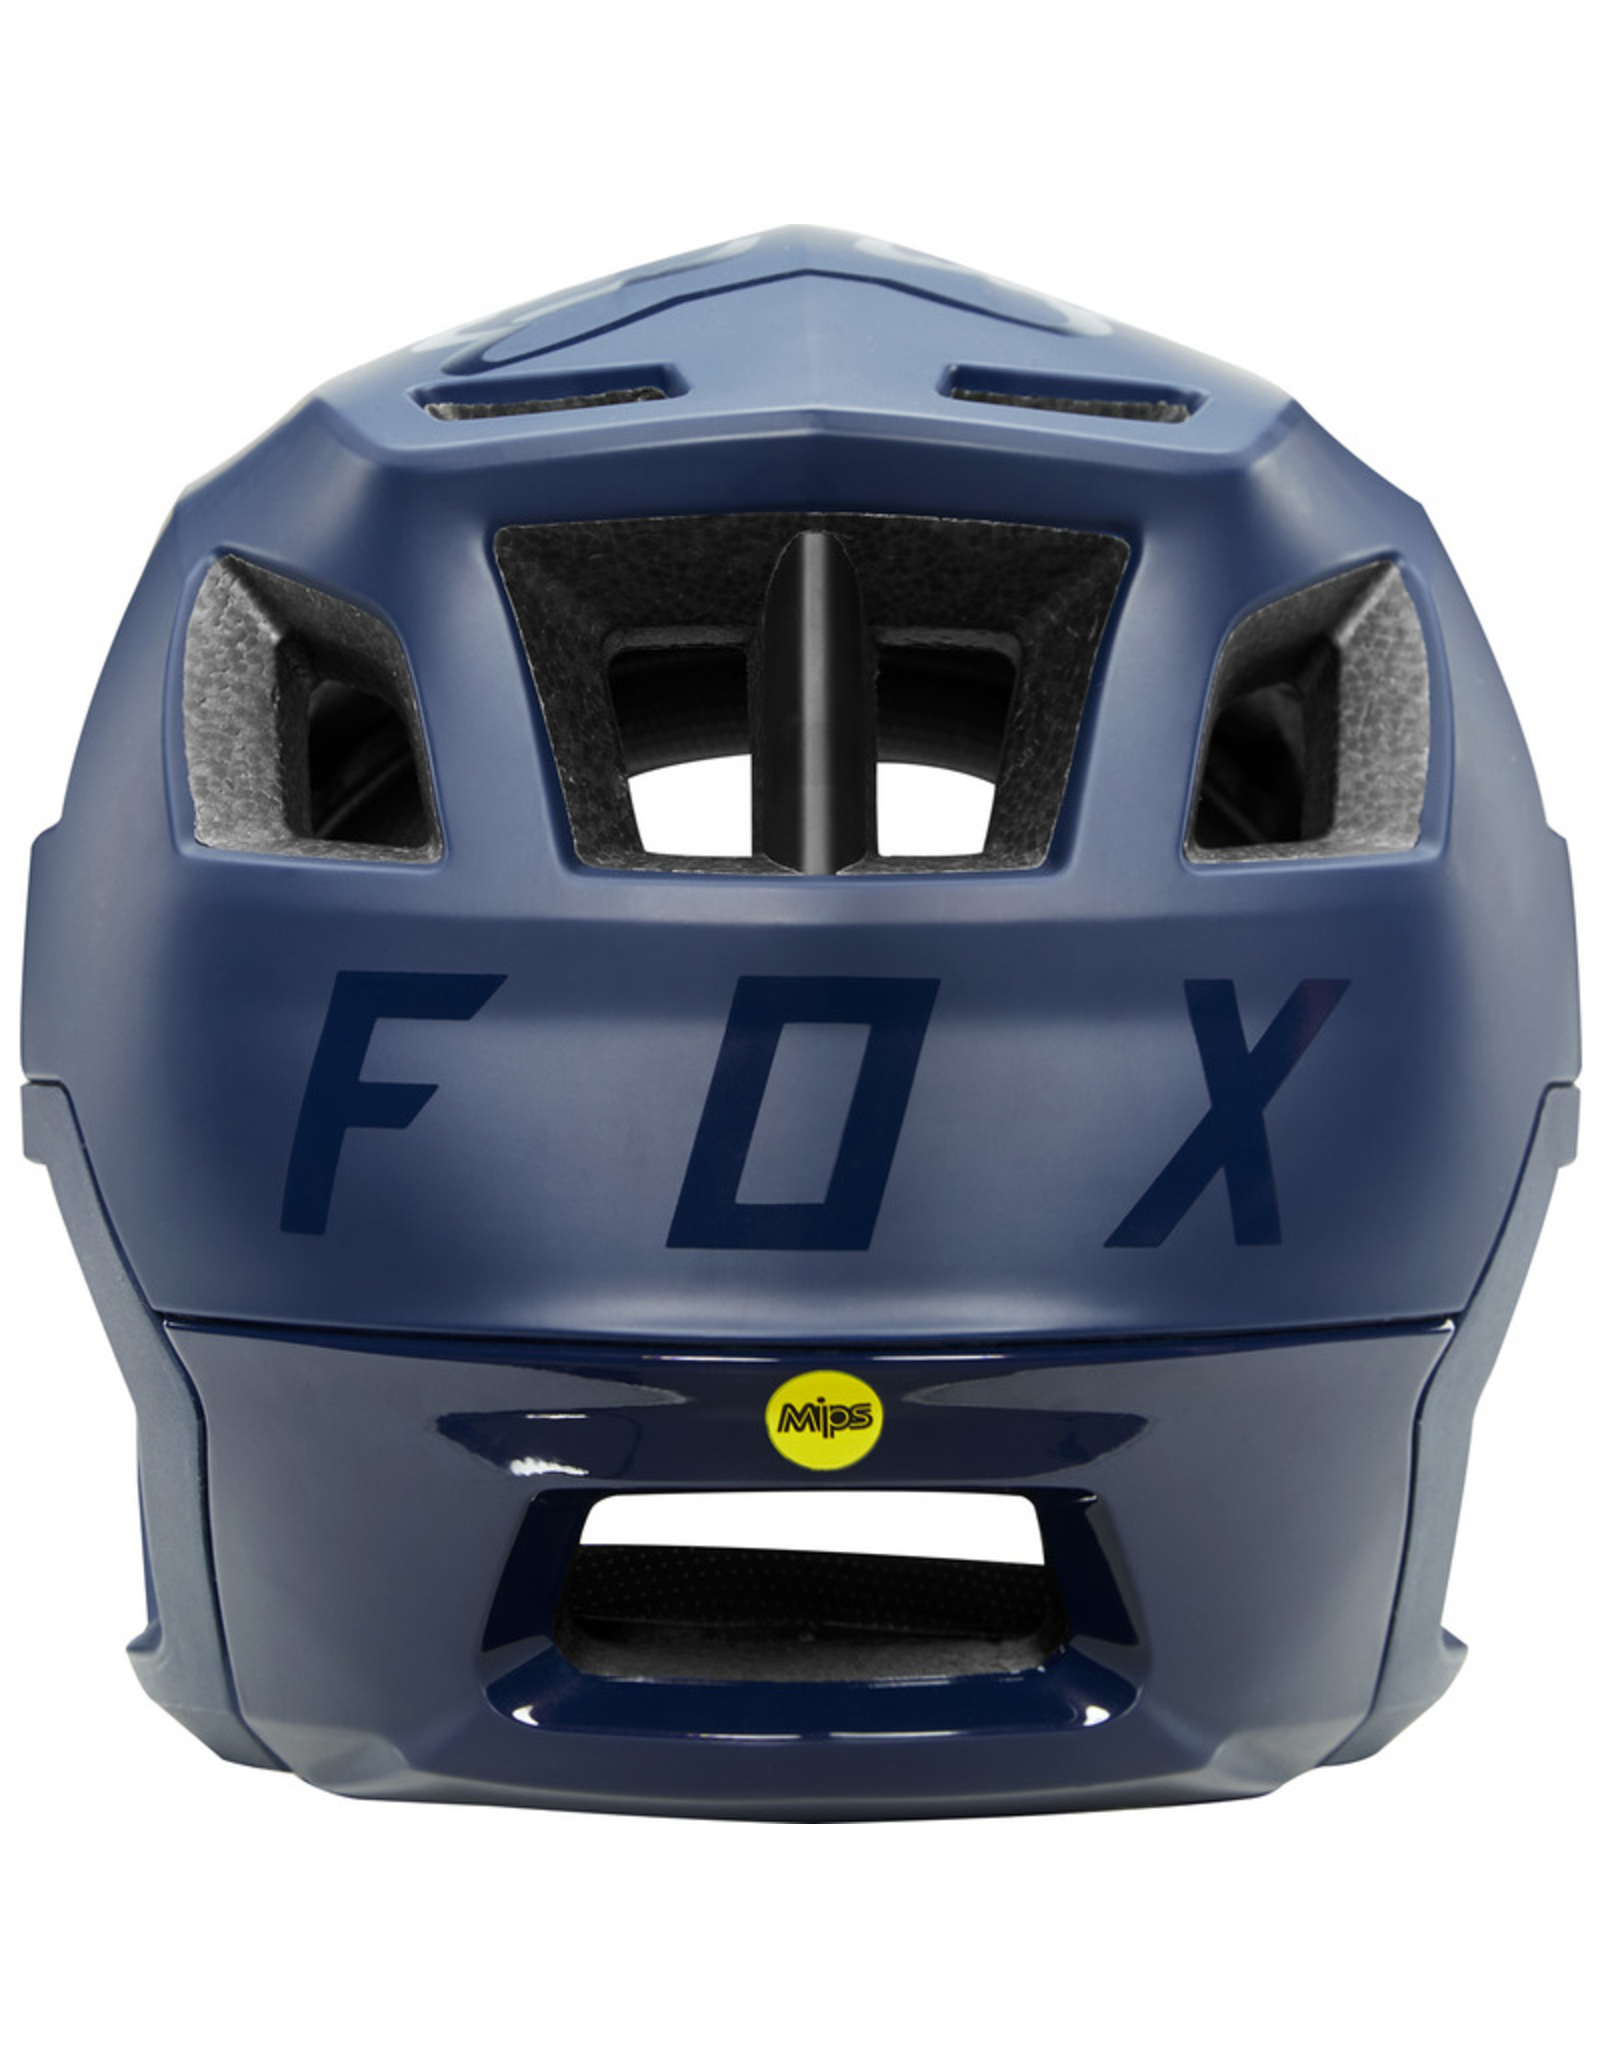 FOX FOX '20 DROPFRAME PRO HELMET